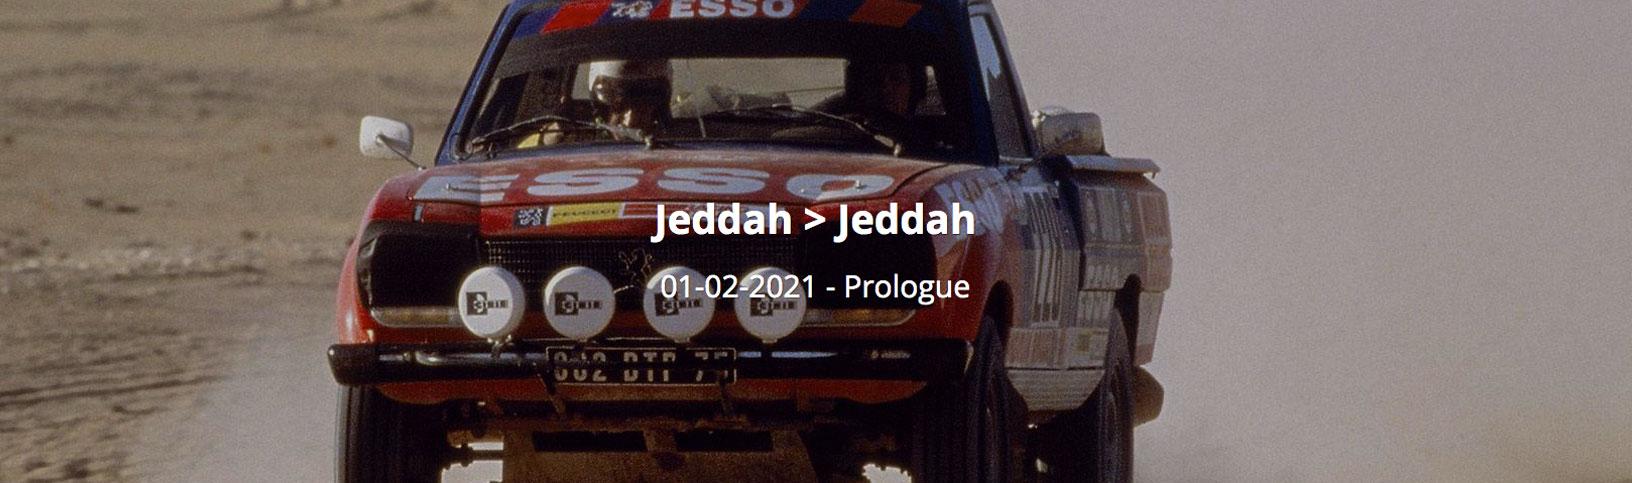 Dakar-Prol.jpg